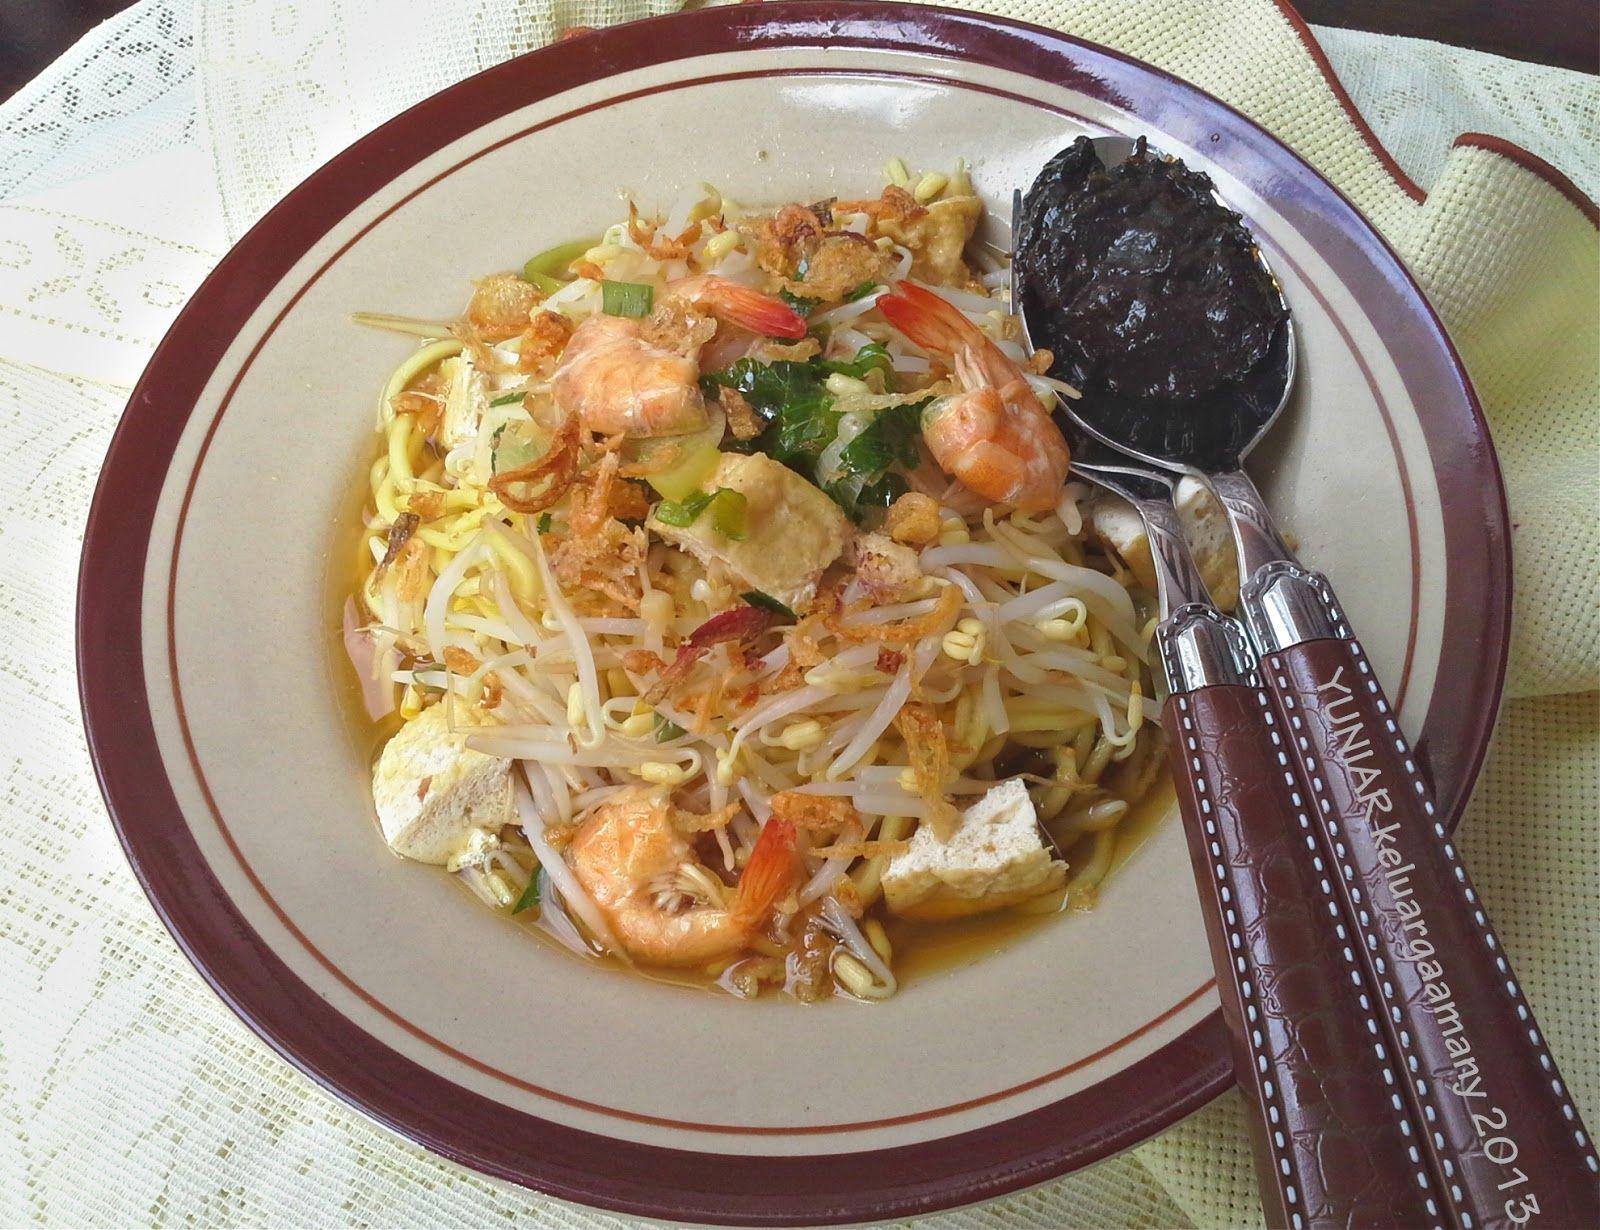 Keluarga Kami Lontong Mie Surabaya Resep Masakan Indonesia Makan Malam Makanan Dan Minuman